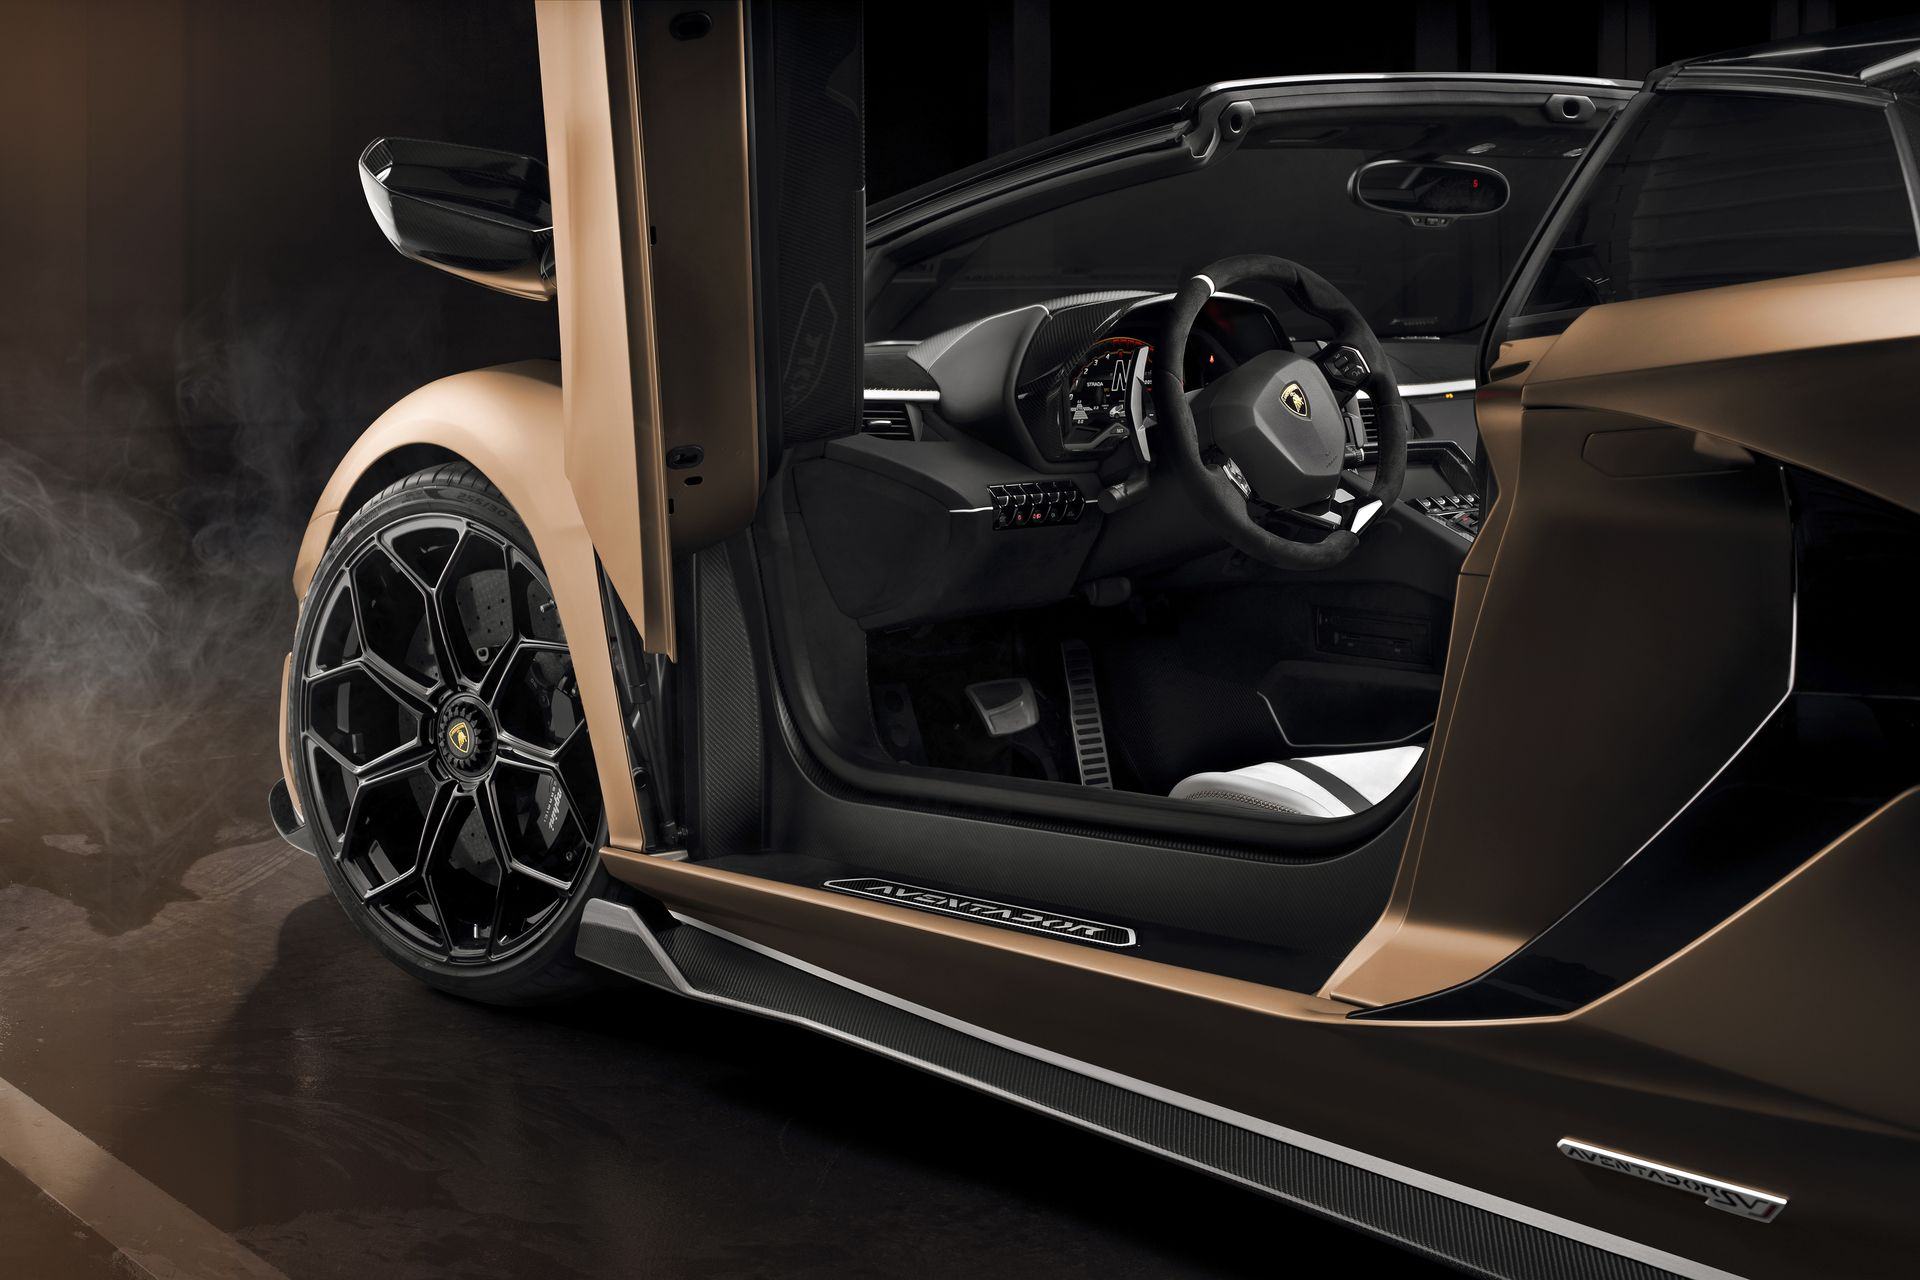 Lamborghini Aventador Svj Roadster 2